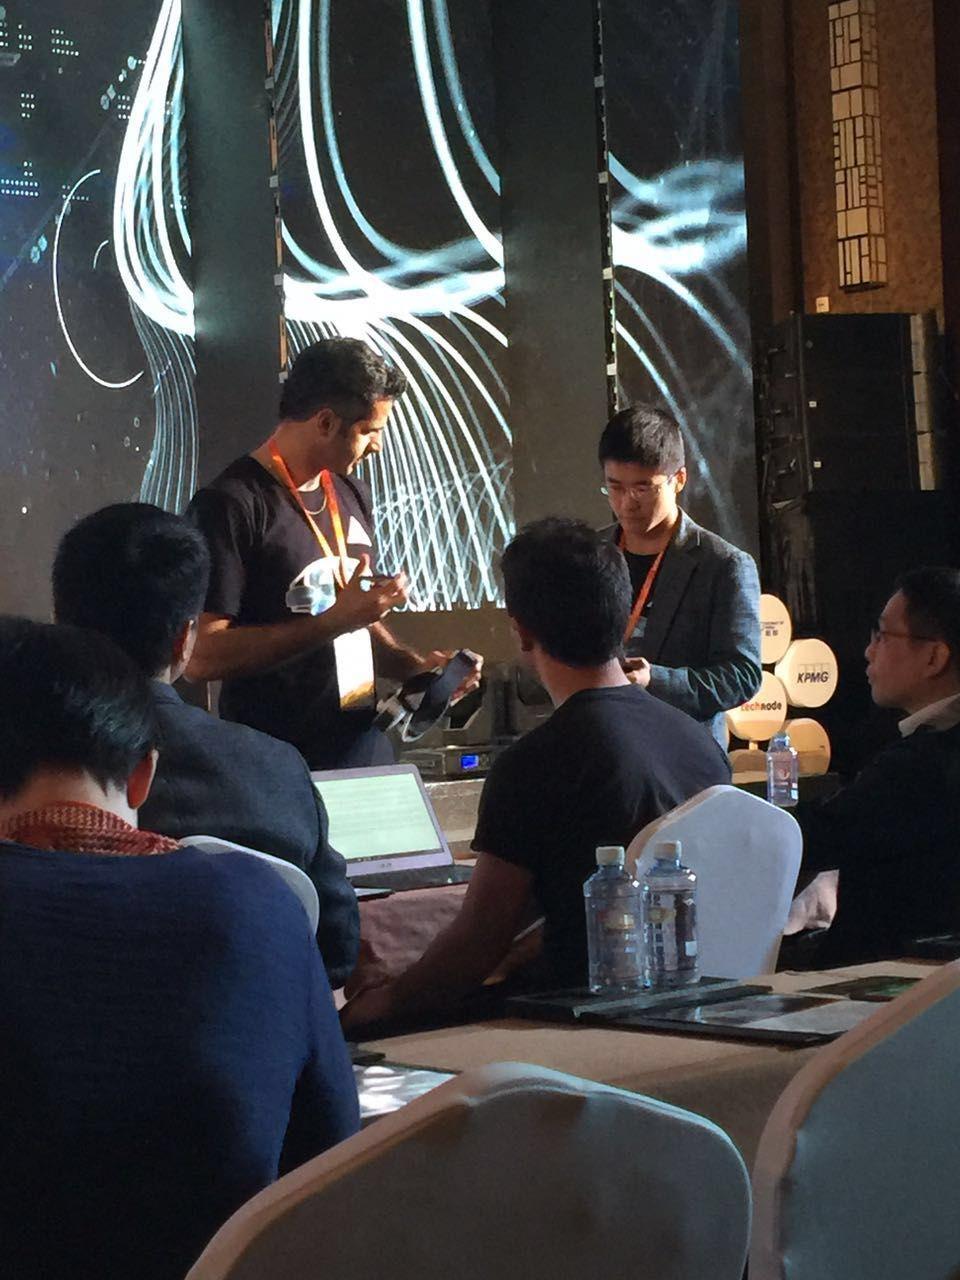 Asia Hardware Battle. #AsiaHardwareBattle #HardwareStartup #Startups #China #Success #finale #IndiaStartupHunt #MakeInIndia #Event